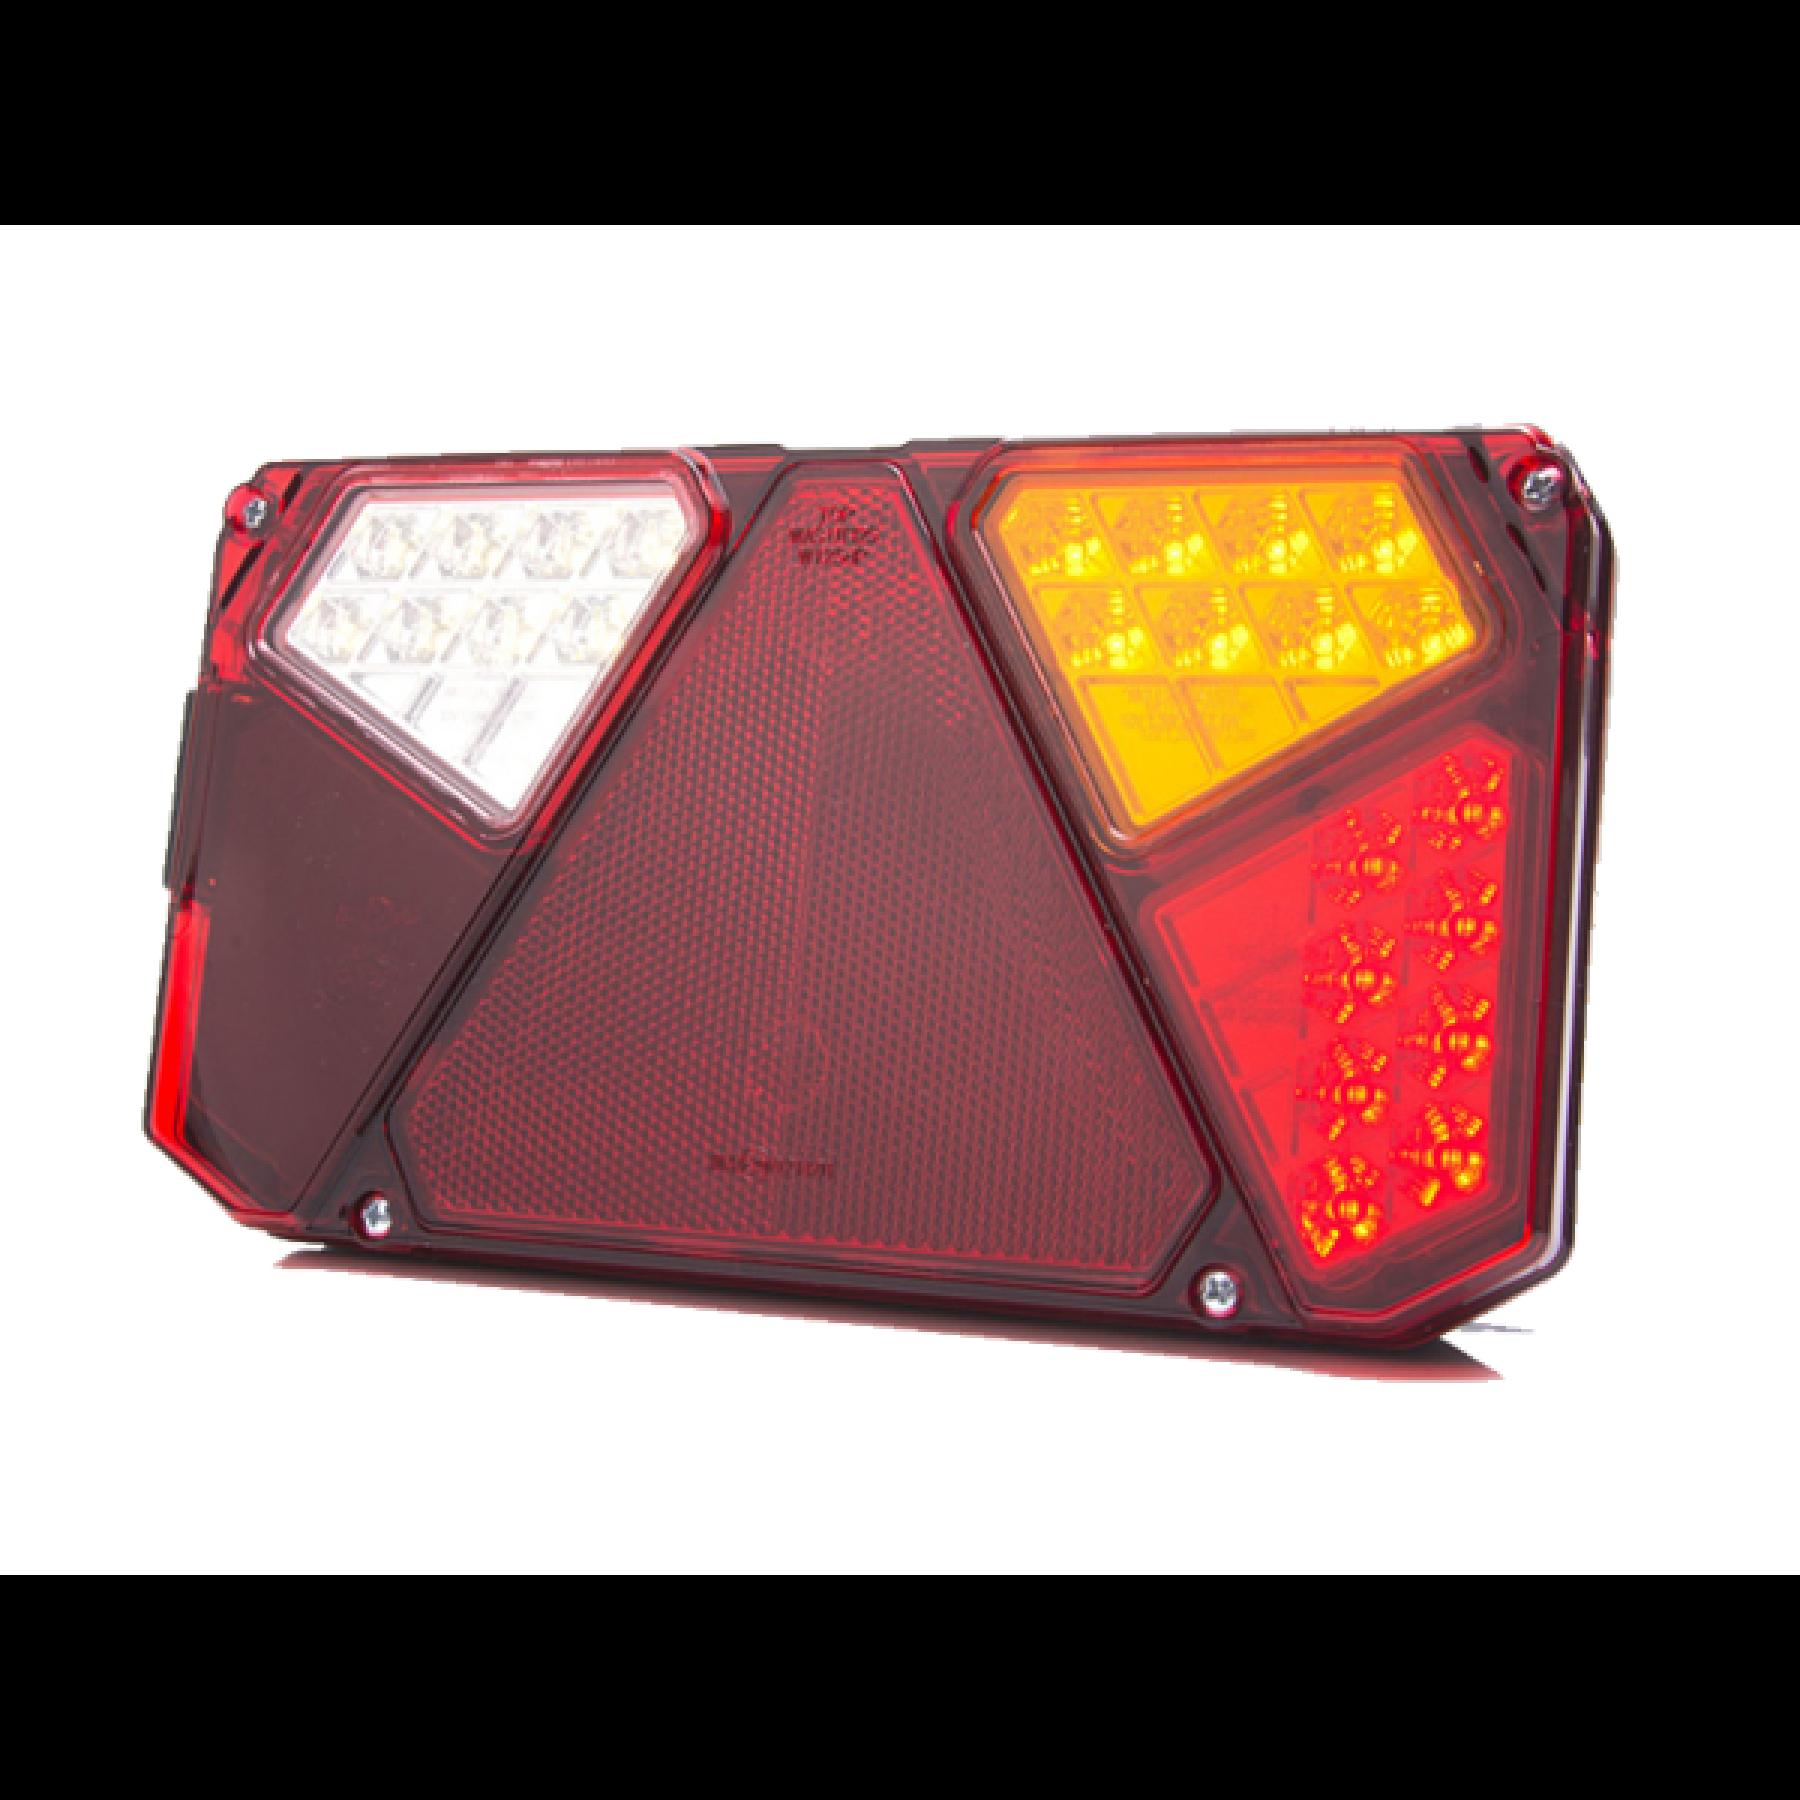 Achterlicht rechthoekig m.driehoek LED 12/24v. rechts